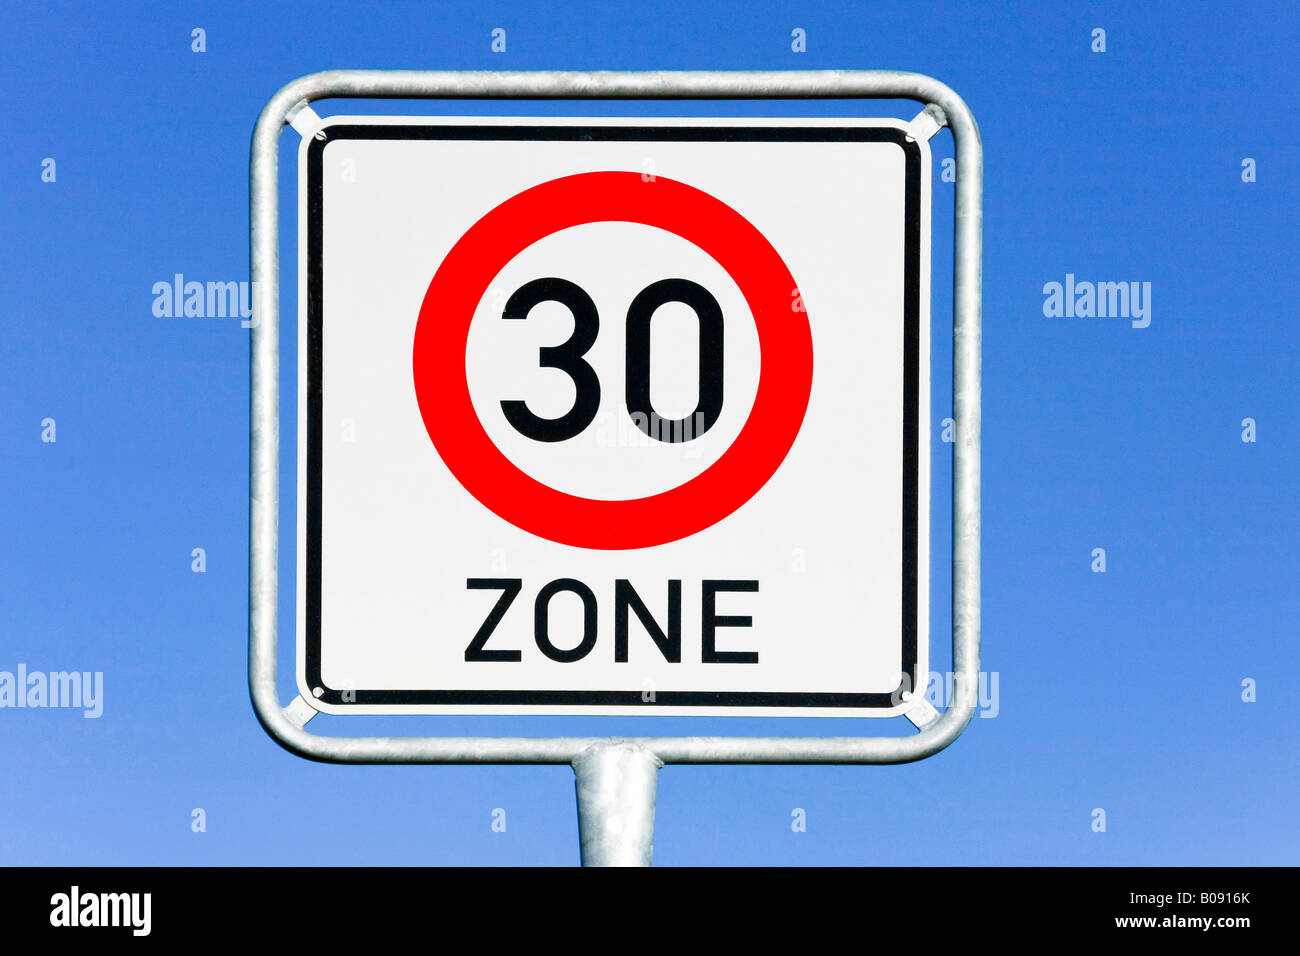 Traffic sign, 30 km/h speed limit - Stock Image